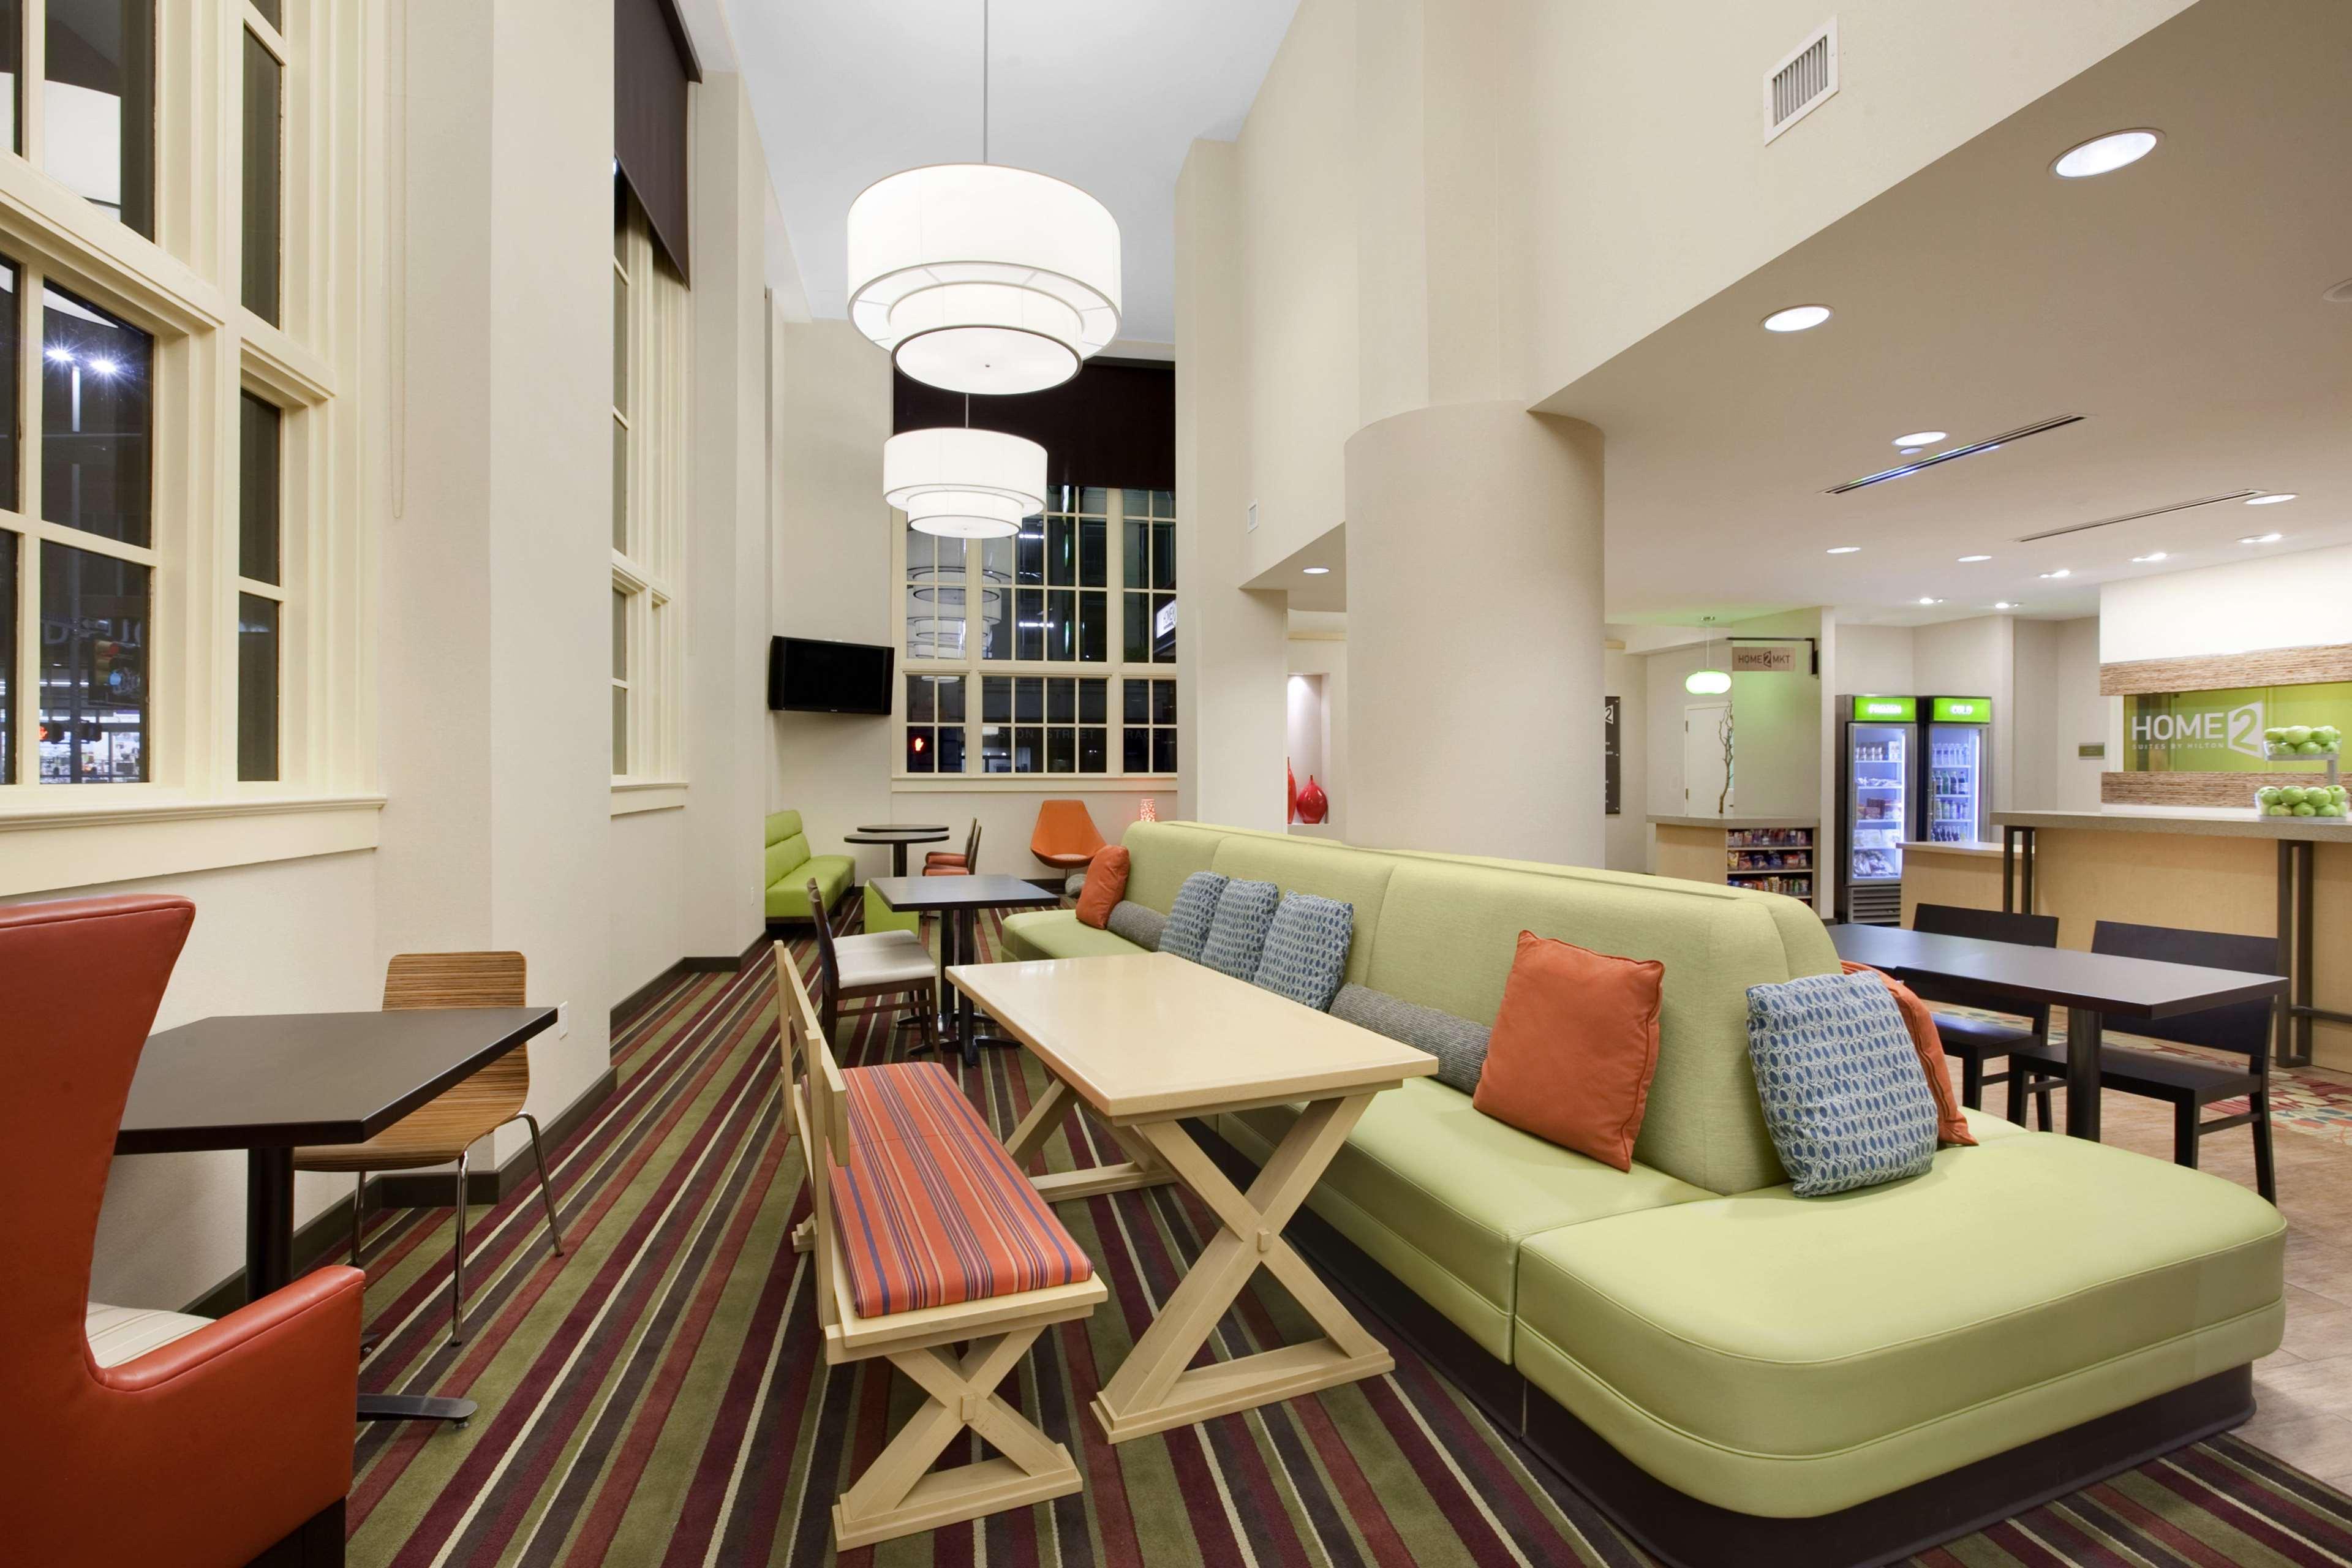 Home2 Suites by Hilton San Antonio Downtown - Riverwalk, TX